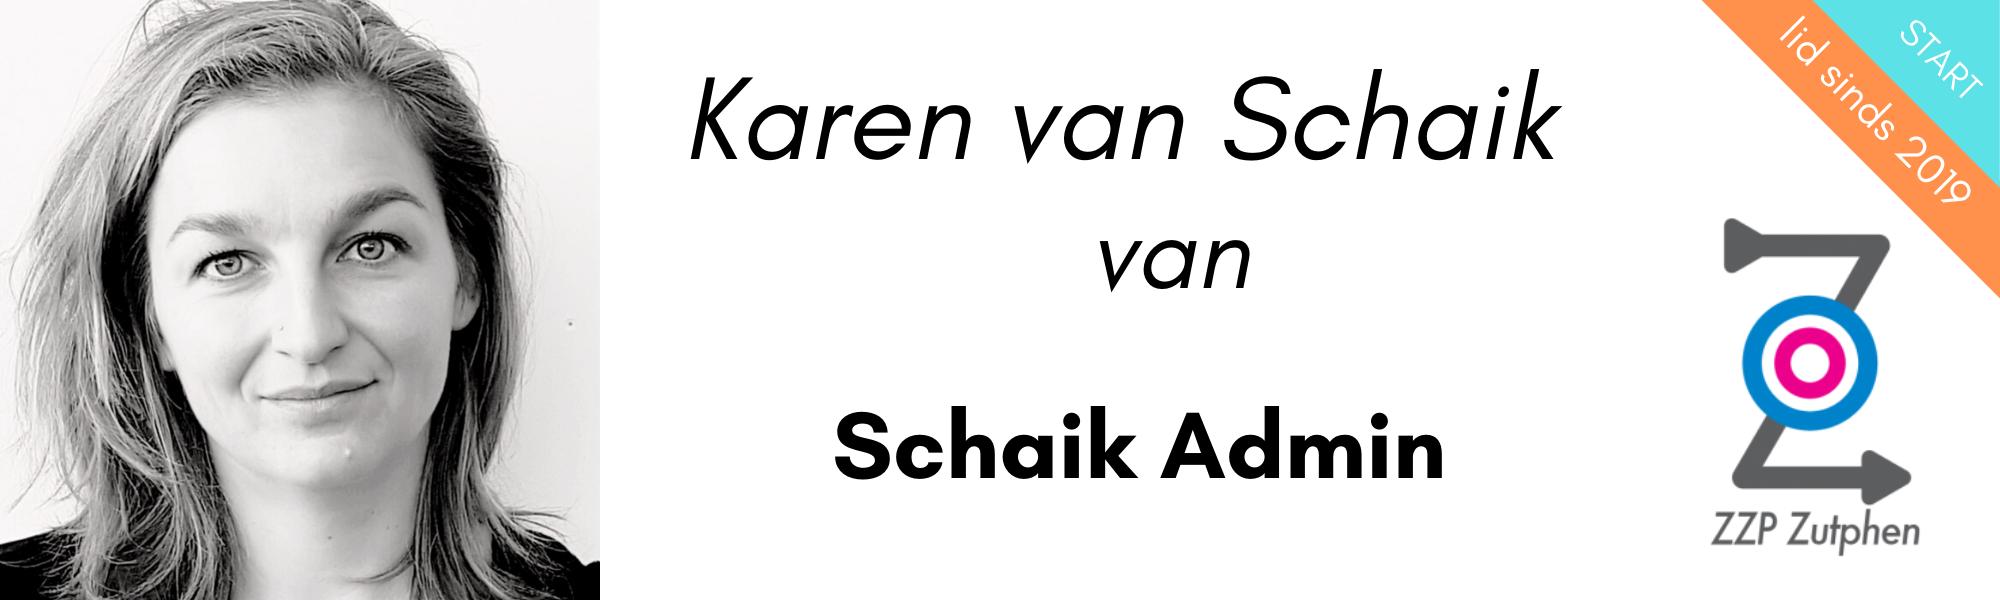 schaik-admin-boekhouder-zzp-zutphen